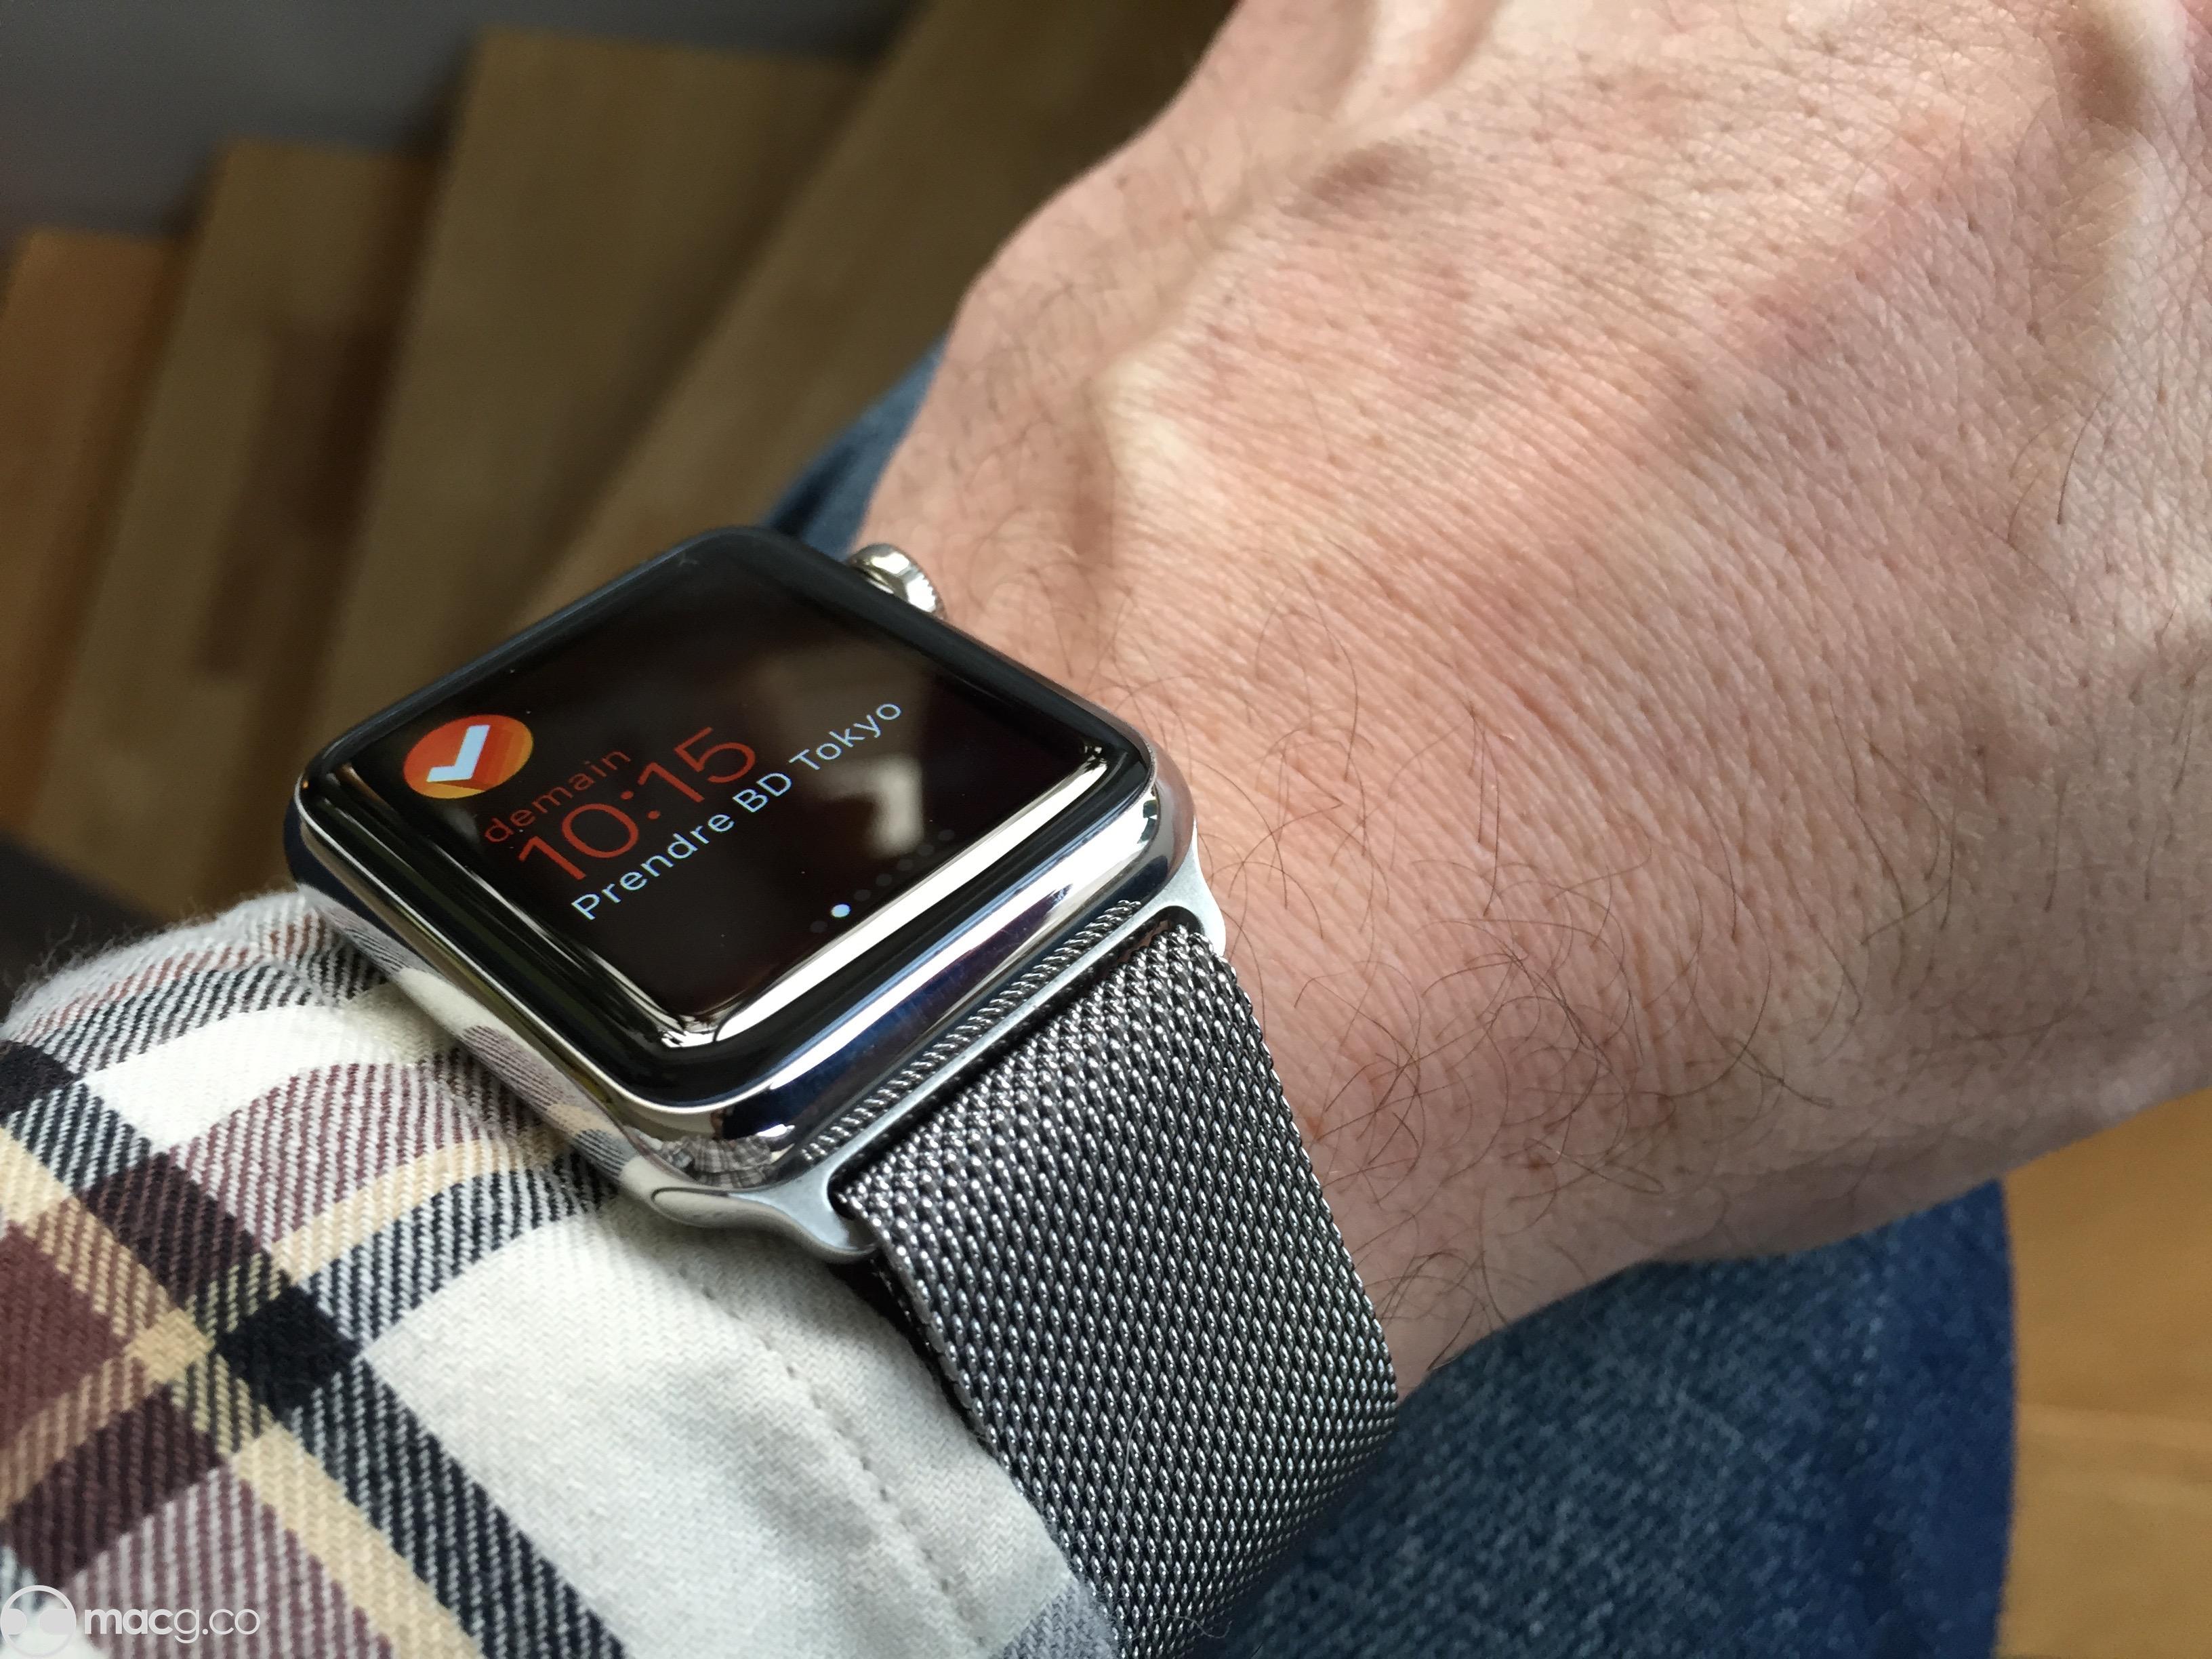 Montre montre Watch Watch Apple Homme Hermes DH2EIW9Y